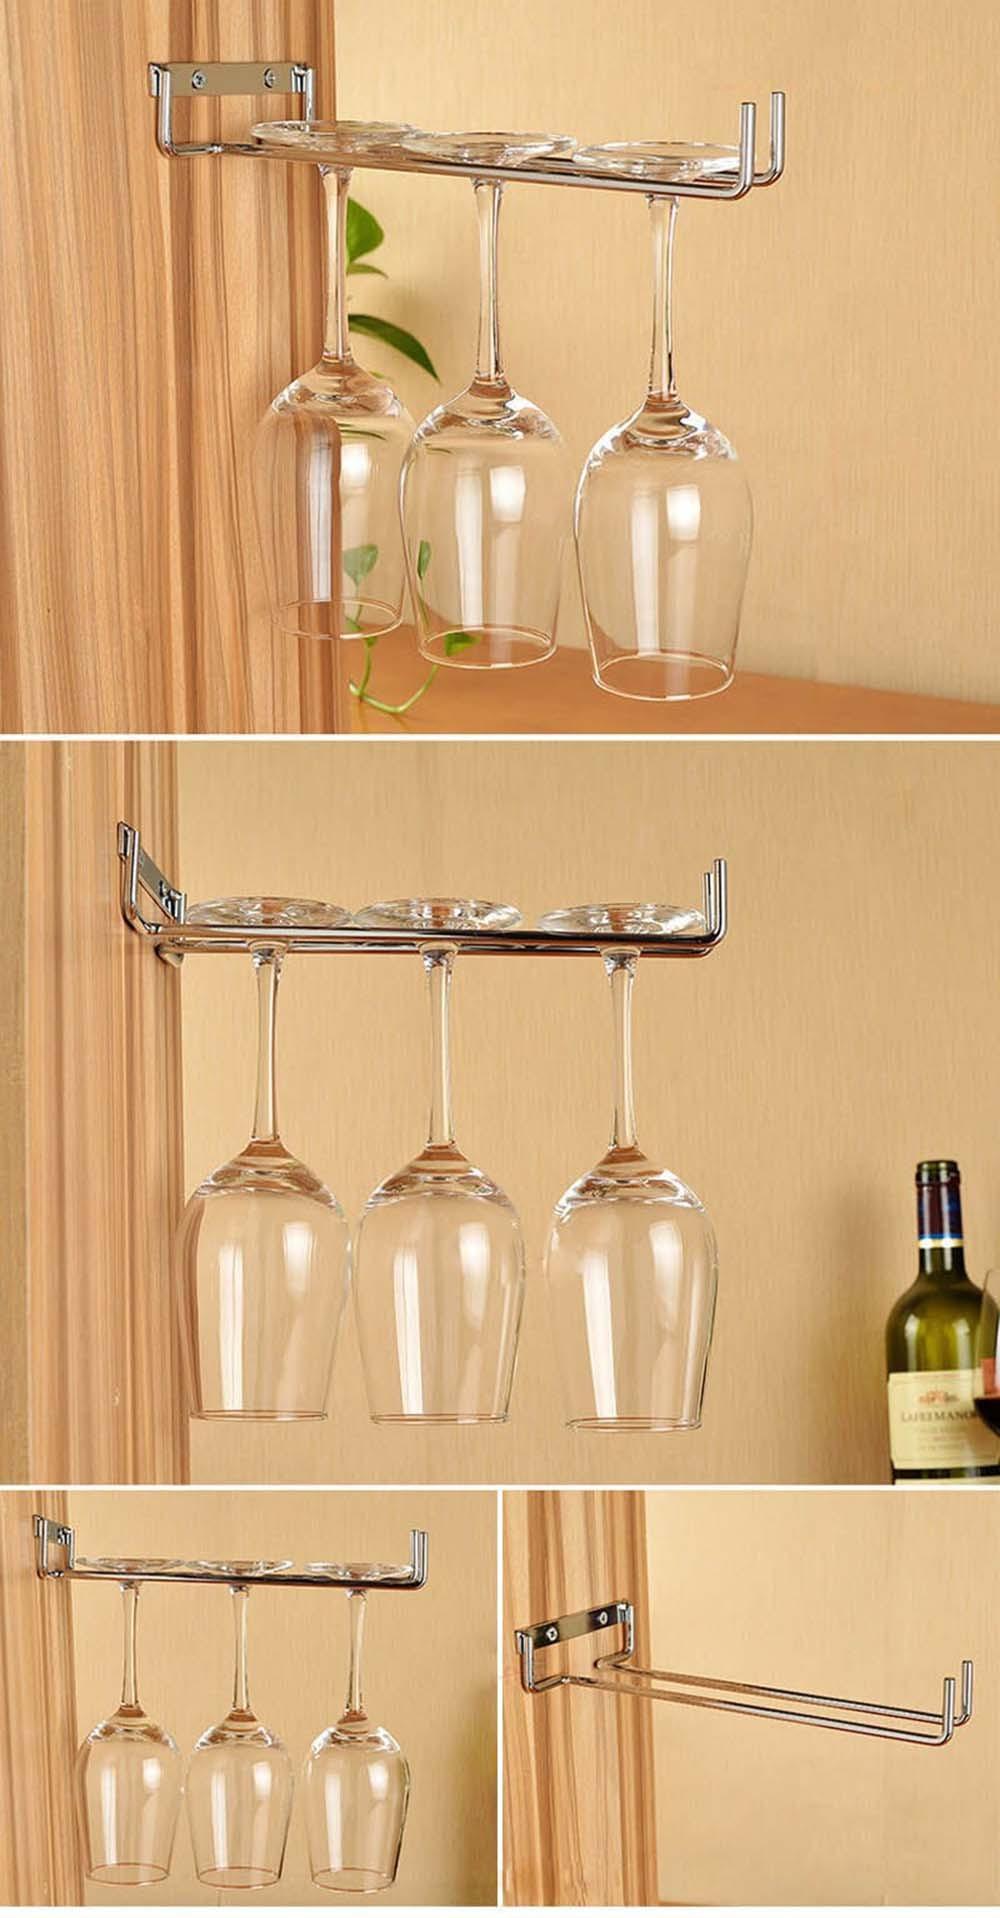 Hanging-Metal-Wine-Cup-Rack-SilverGold-Bar-SingleDouble-Rack-Wine-Stemware-Glass-Bottle-Goblet-Inverted-Holder-KC0026 (6)